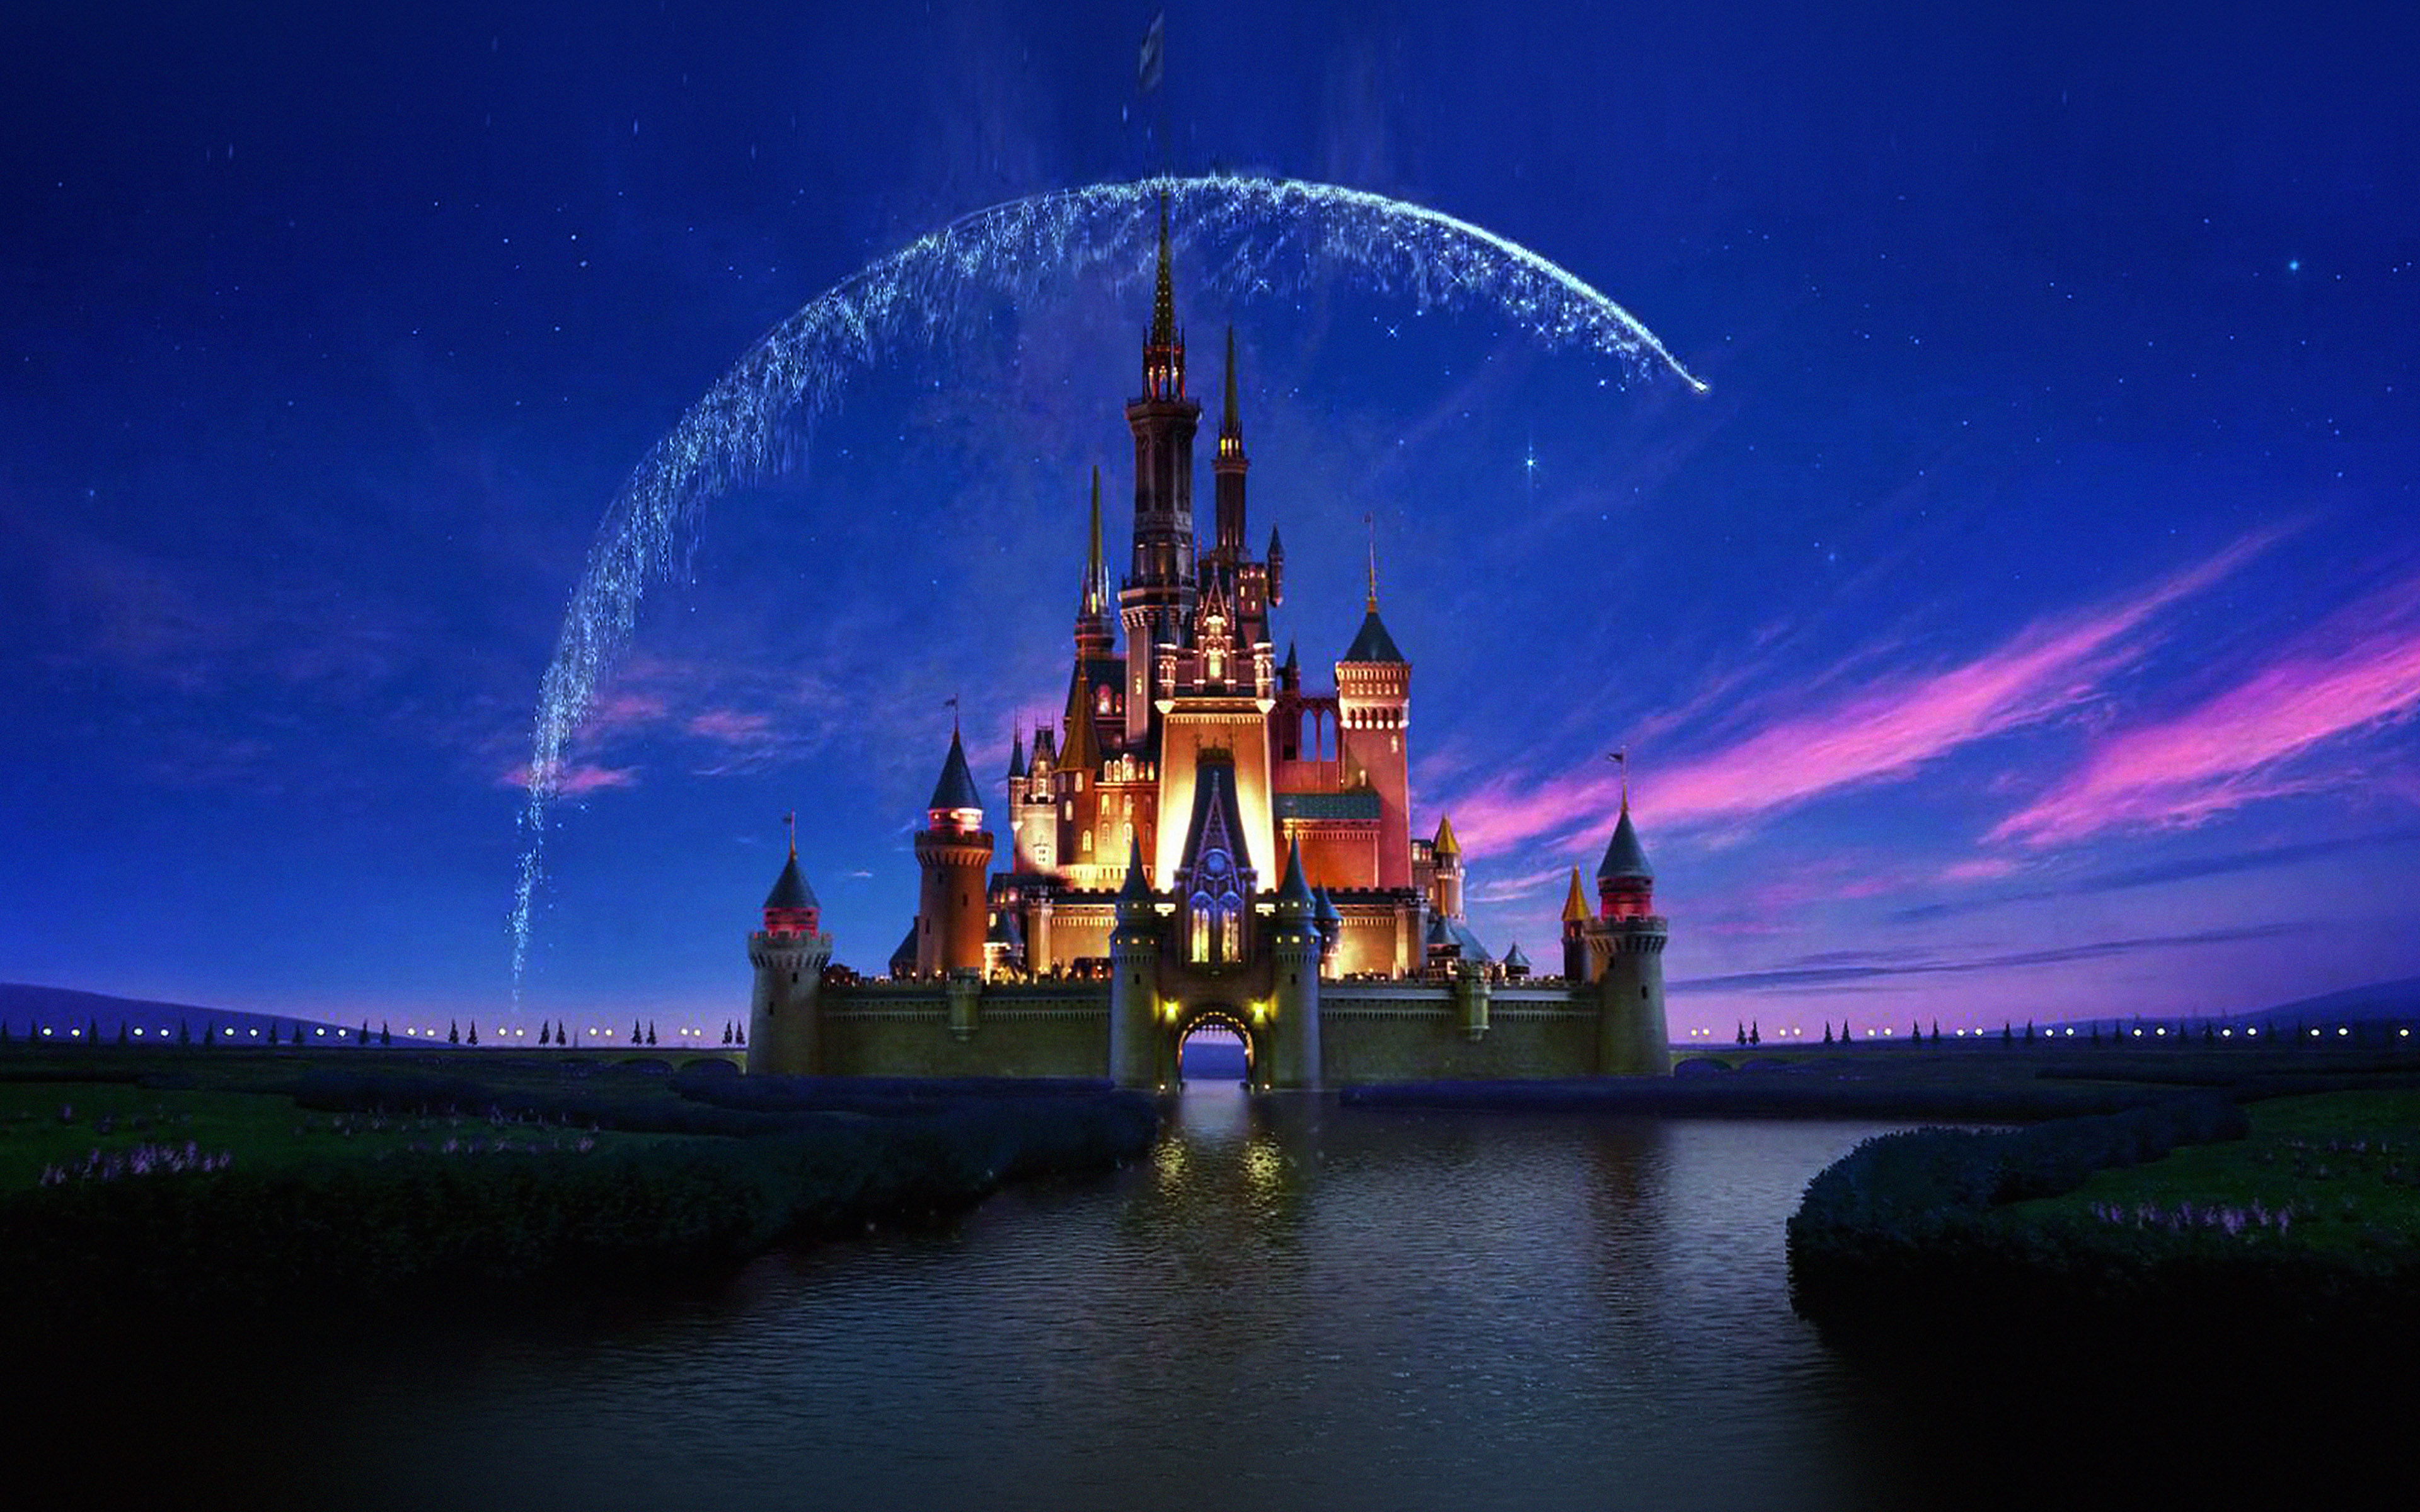 Cool Wallpaper Macbook Disney - papers  Trends_725783.jpg